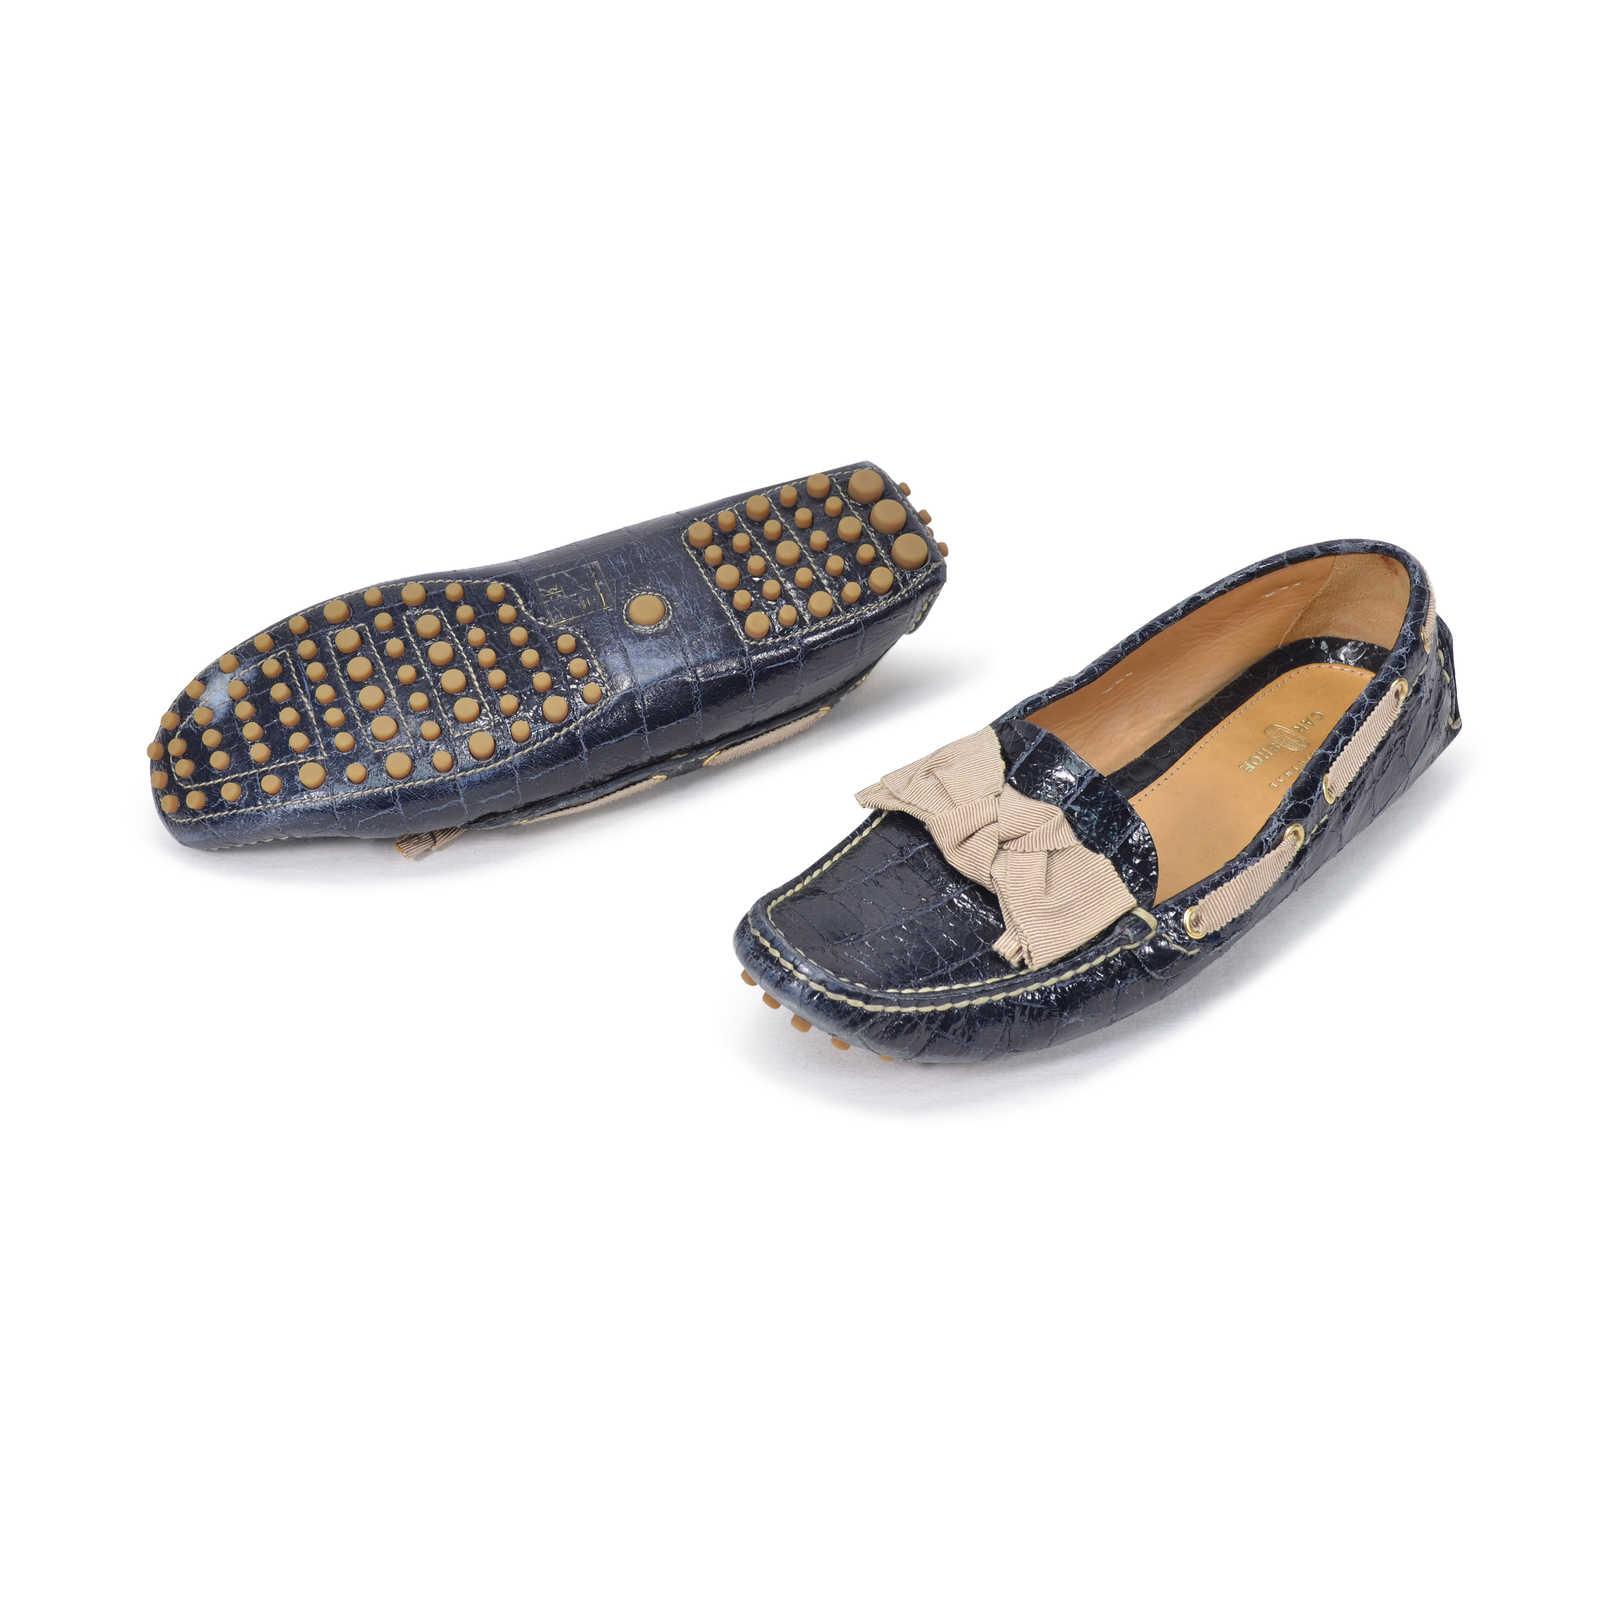 Sale 2018 Prada Car Shoe x Leather Round-Toe Flats Buy Cheap New 2018 Newest aubZmDIJr